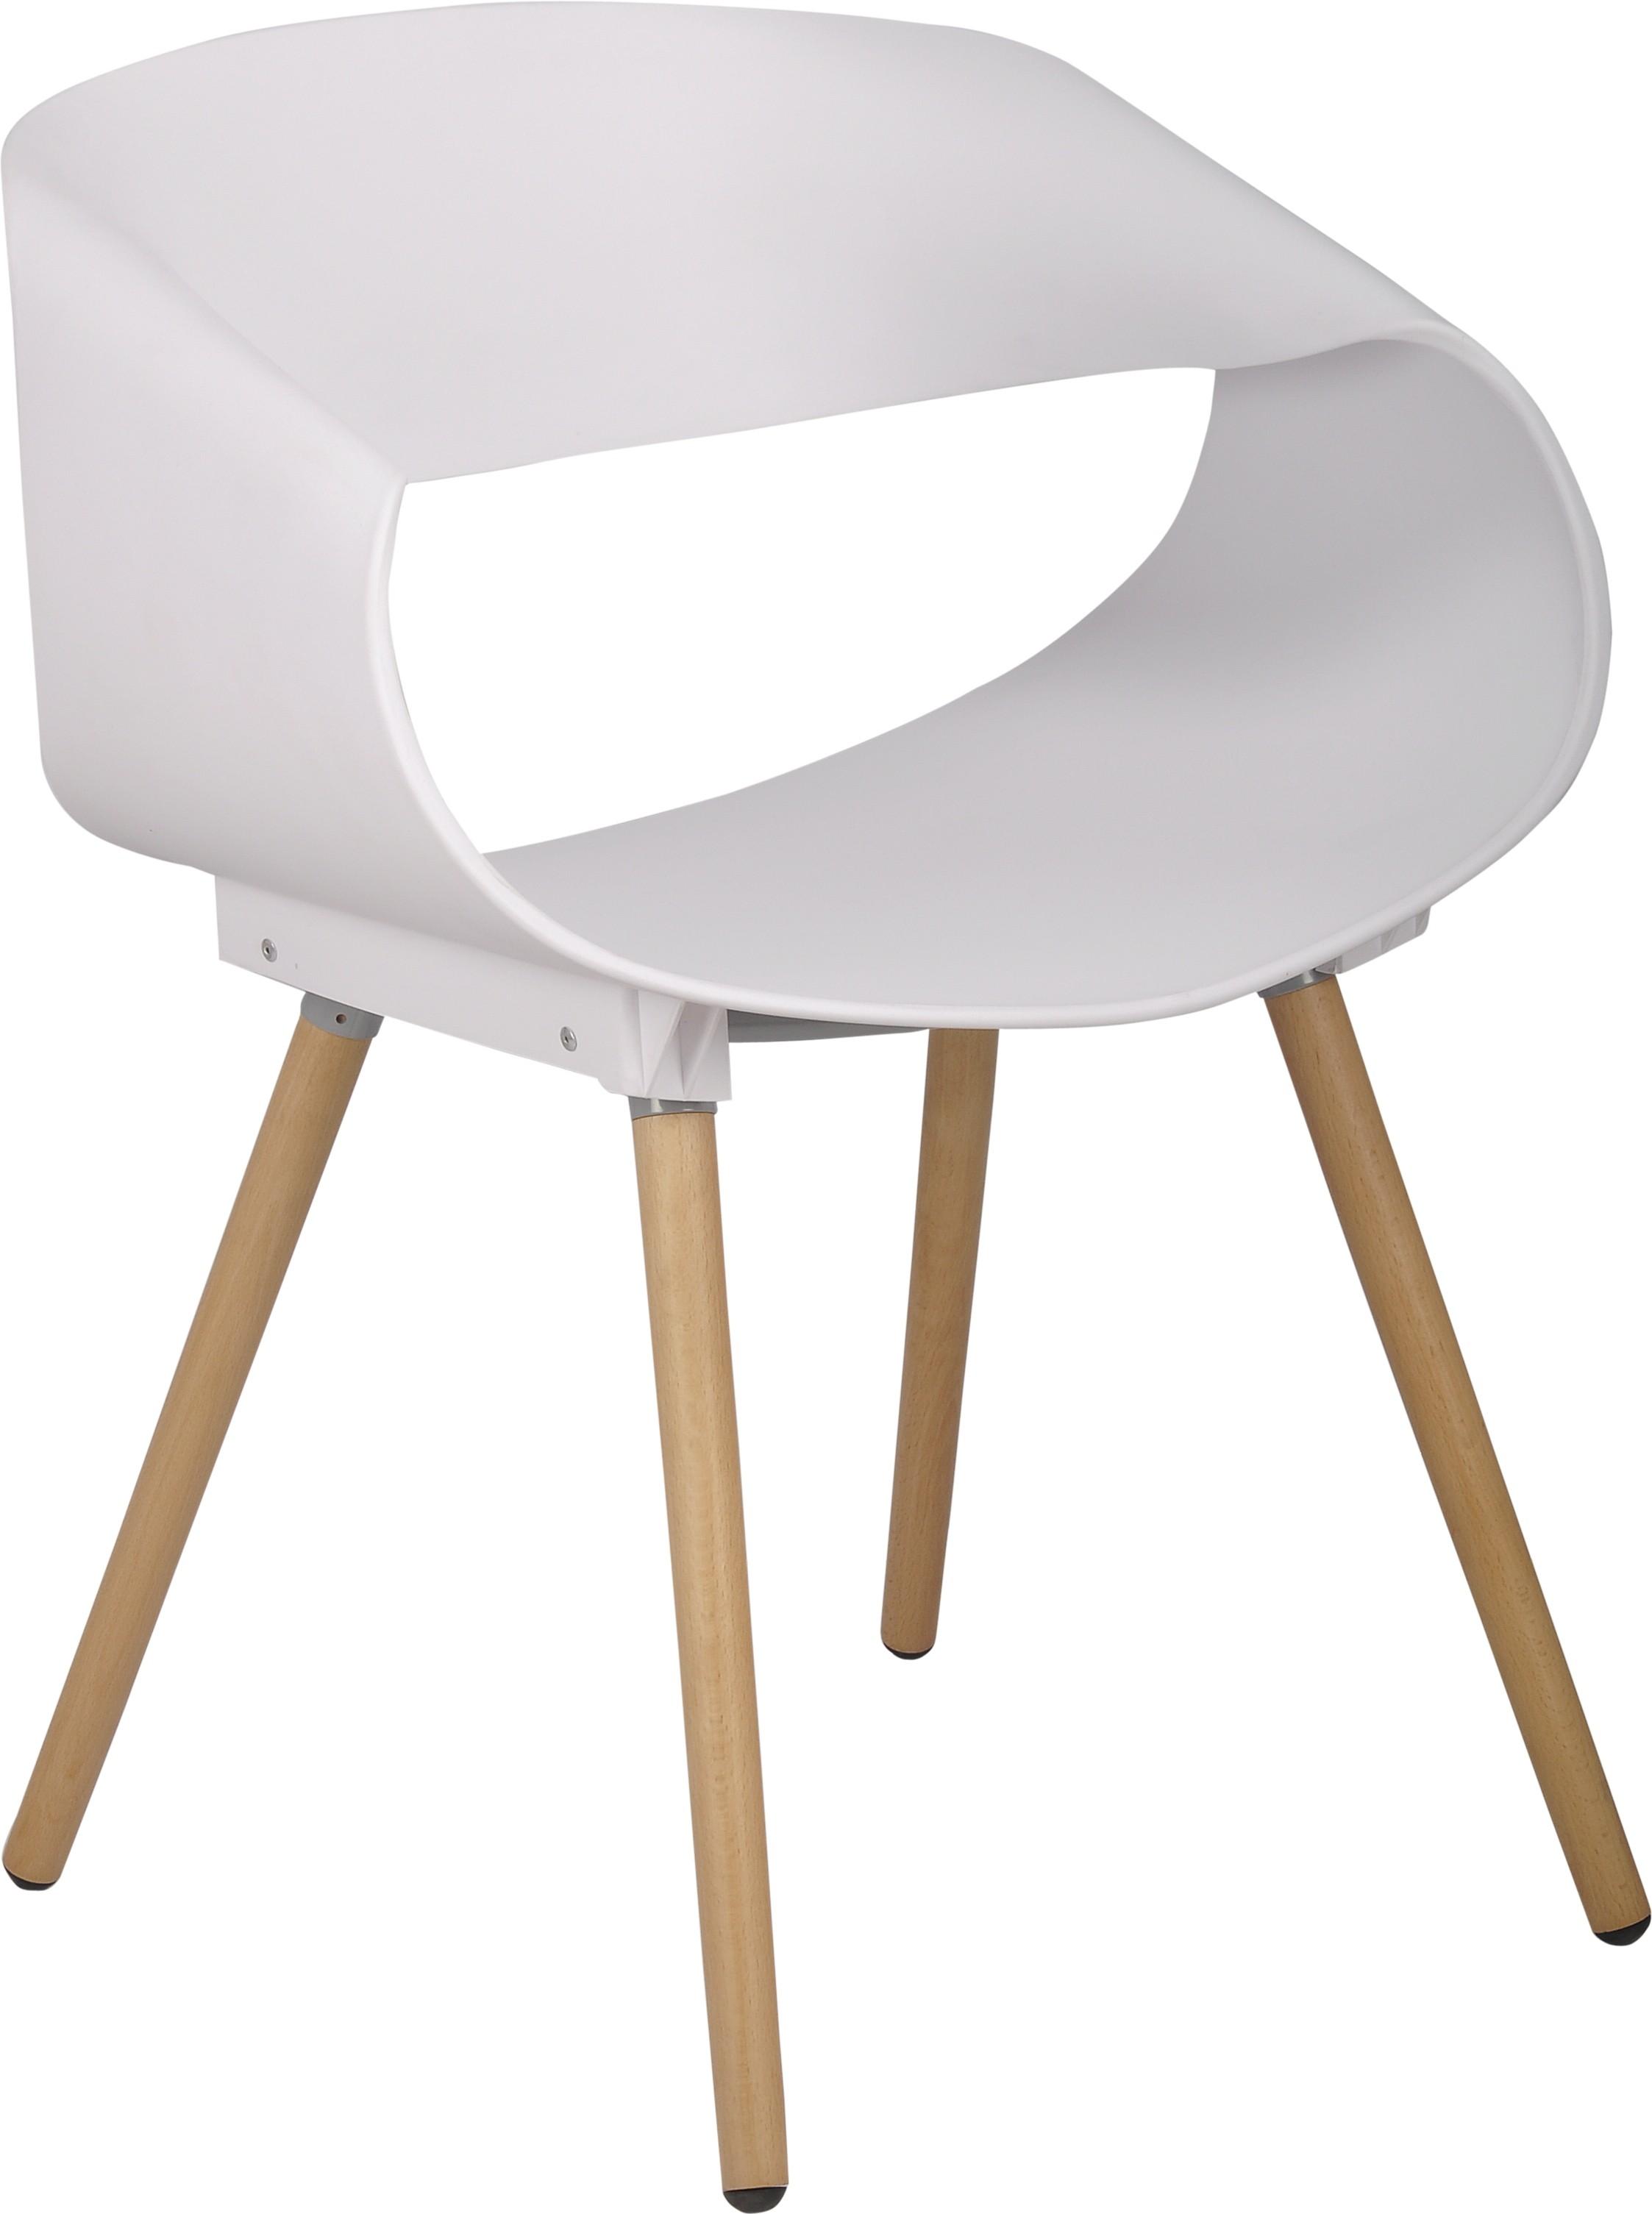 View Bharat Furniture Bella Plastic Living Room Chair(Finish Color - White) Furniture (Bharat Furniture)